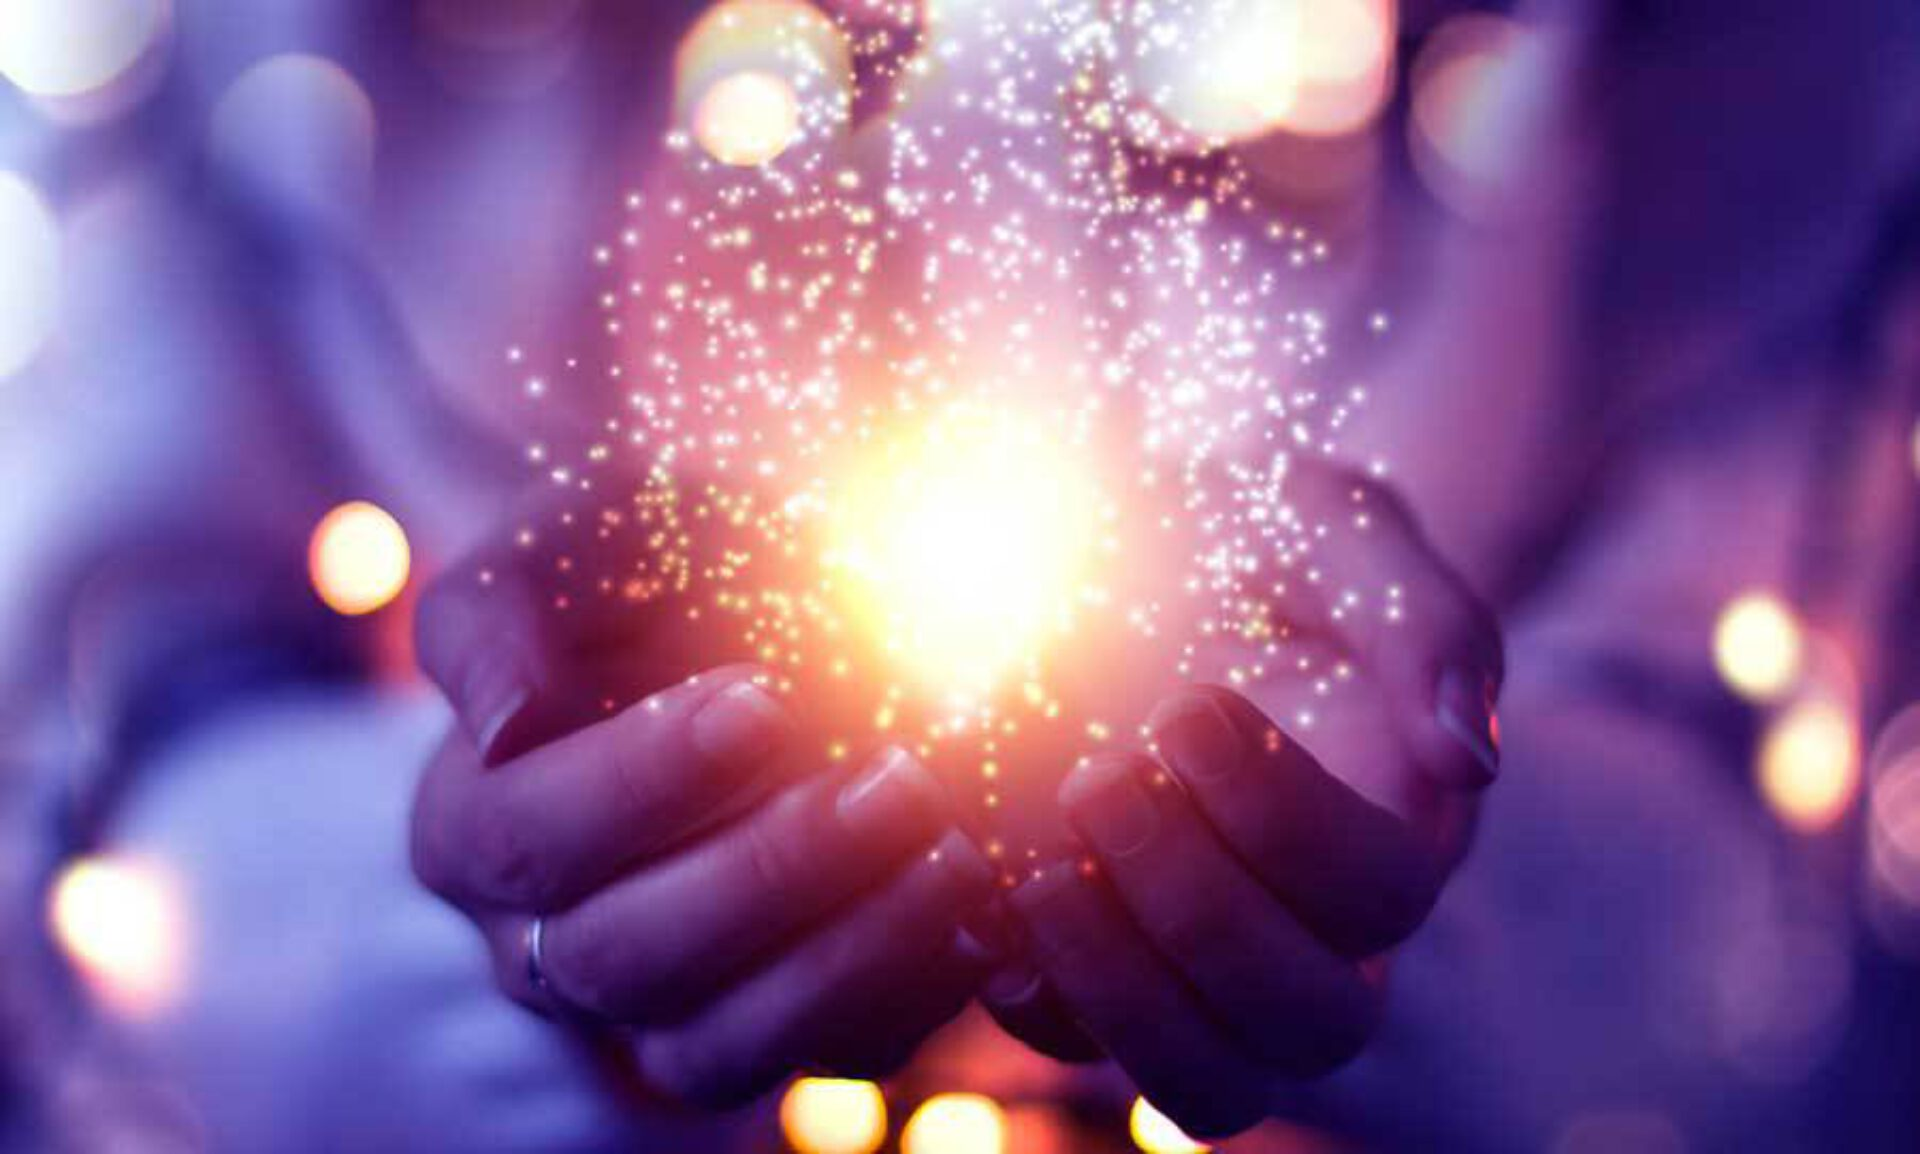 Prana: de universele levensenergie die ons voedt